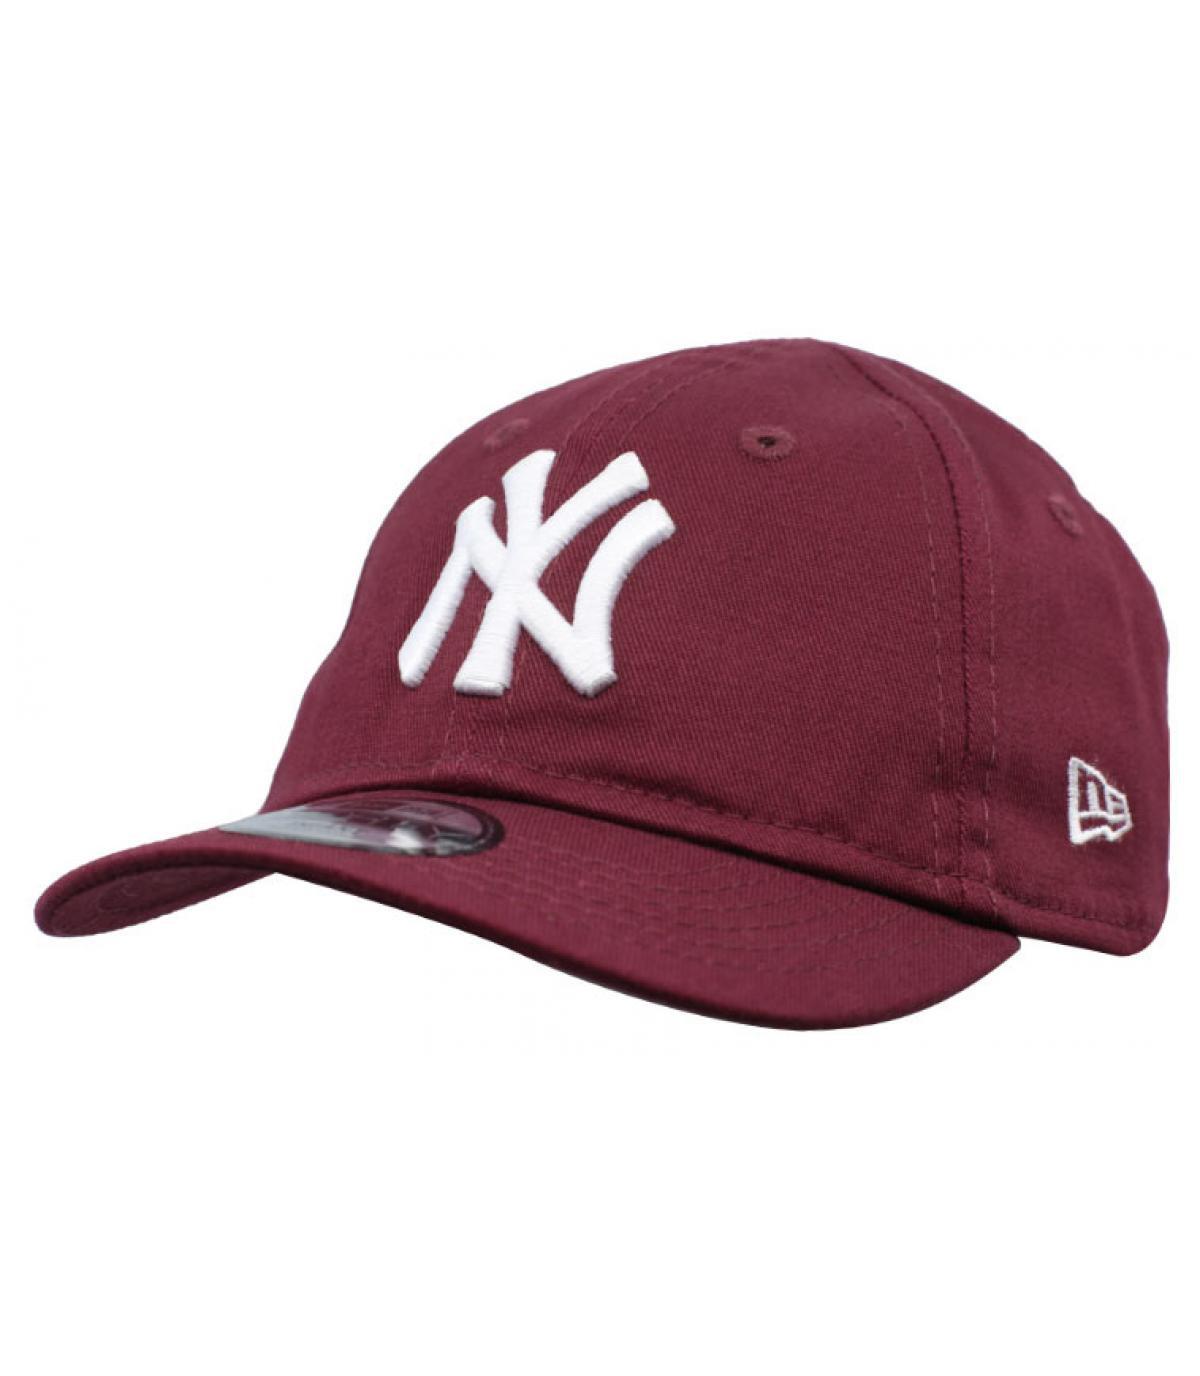 Details Baby Cap League Ess NY 9Forty maroon - Abbildung 2